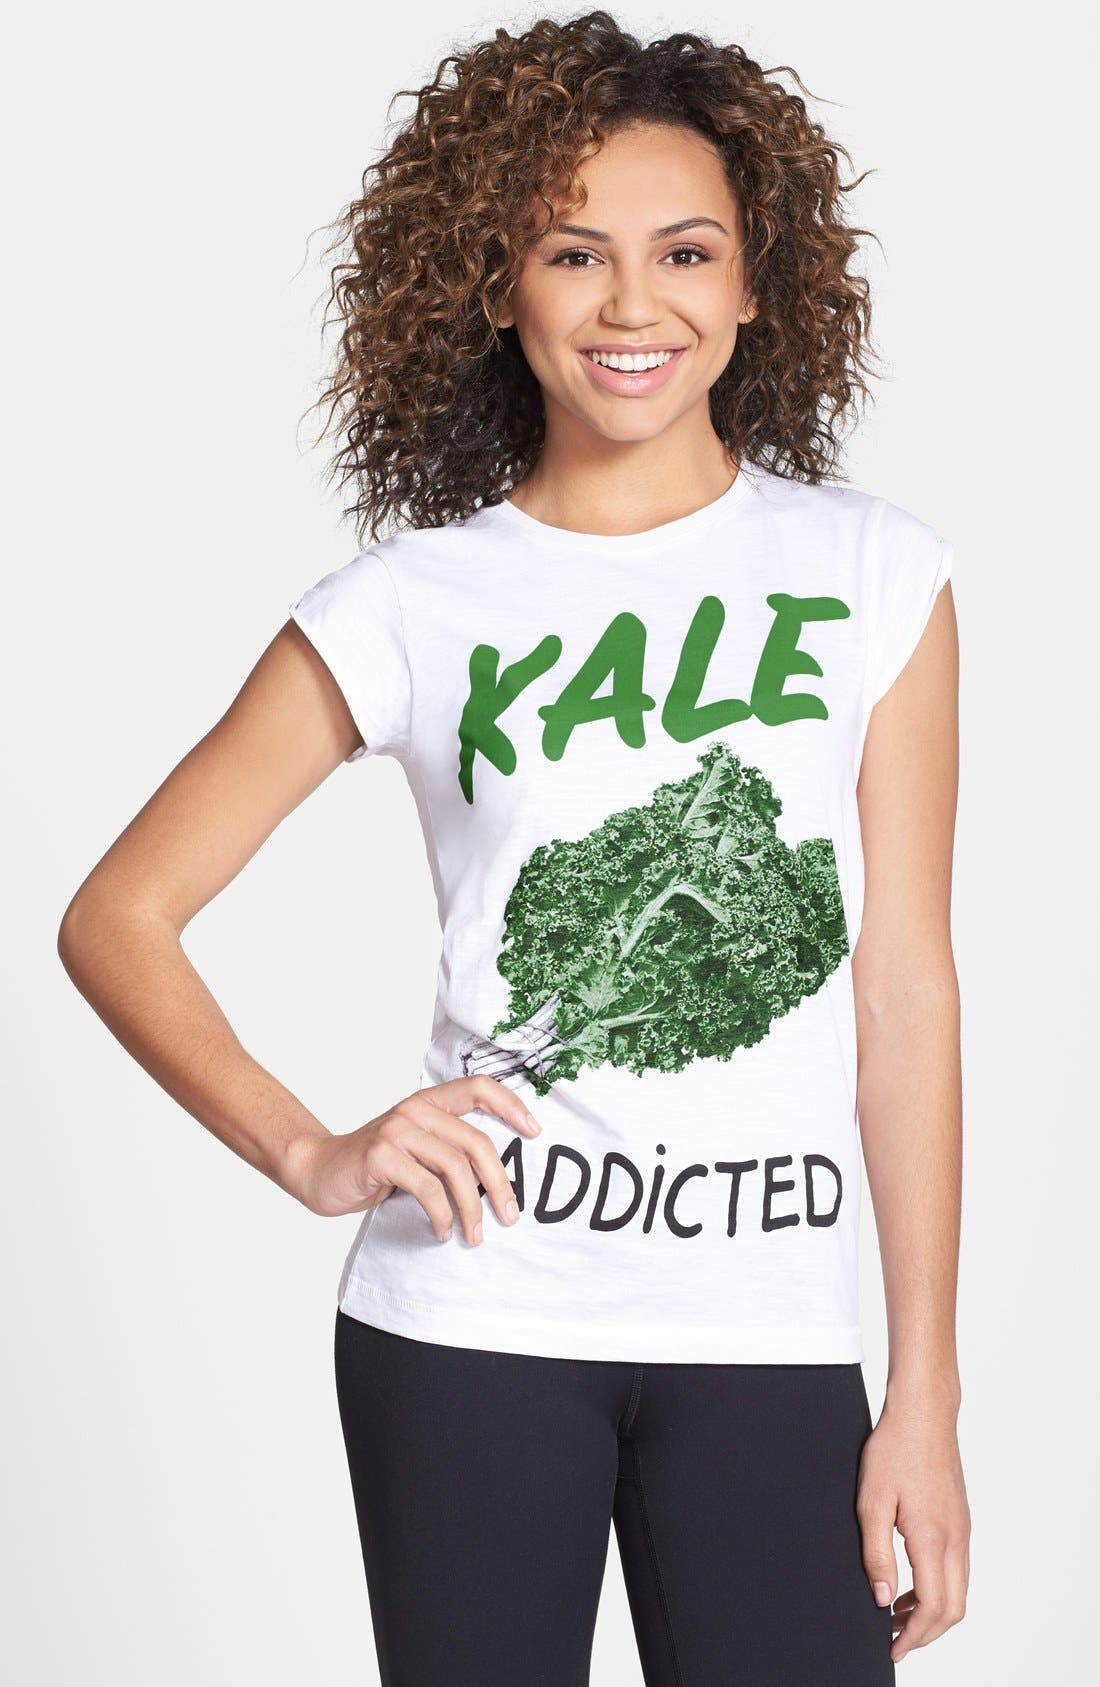 Main Image - Happiness® 'Kale Addicted' Cotton Tee